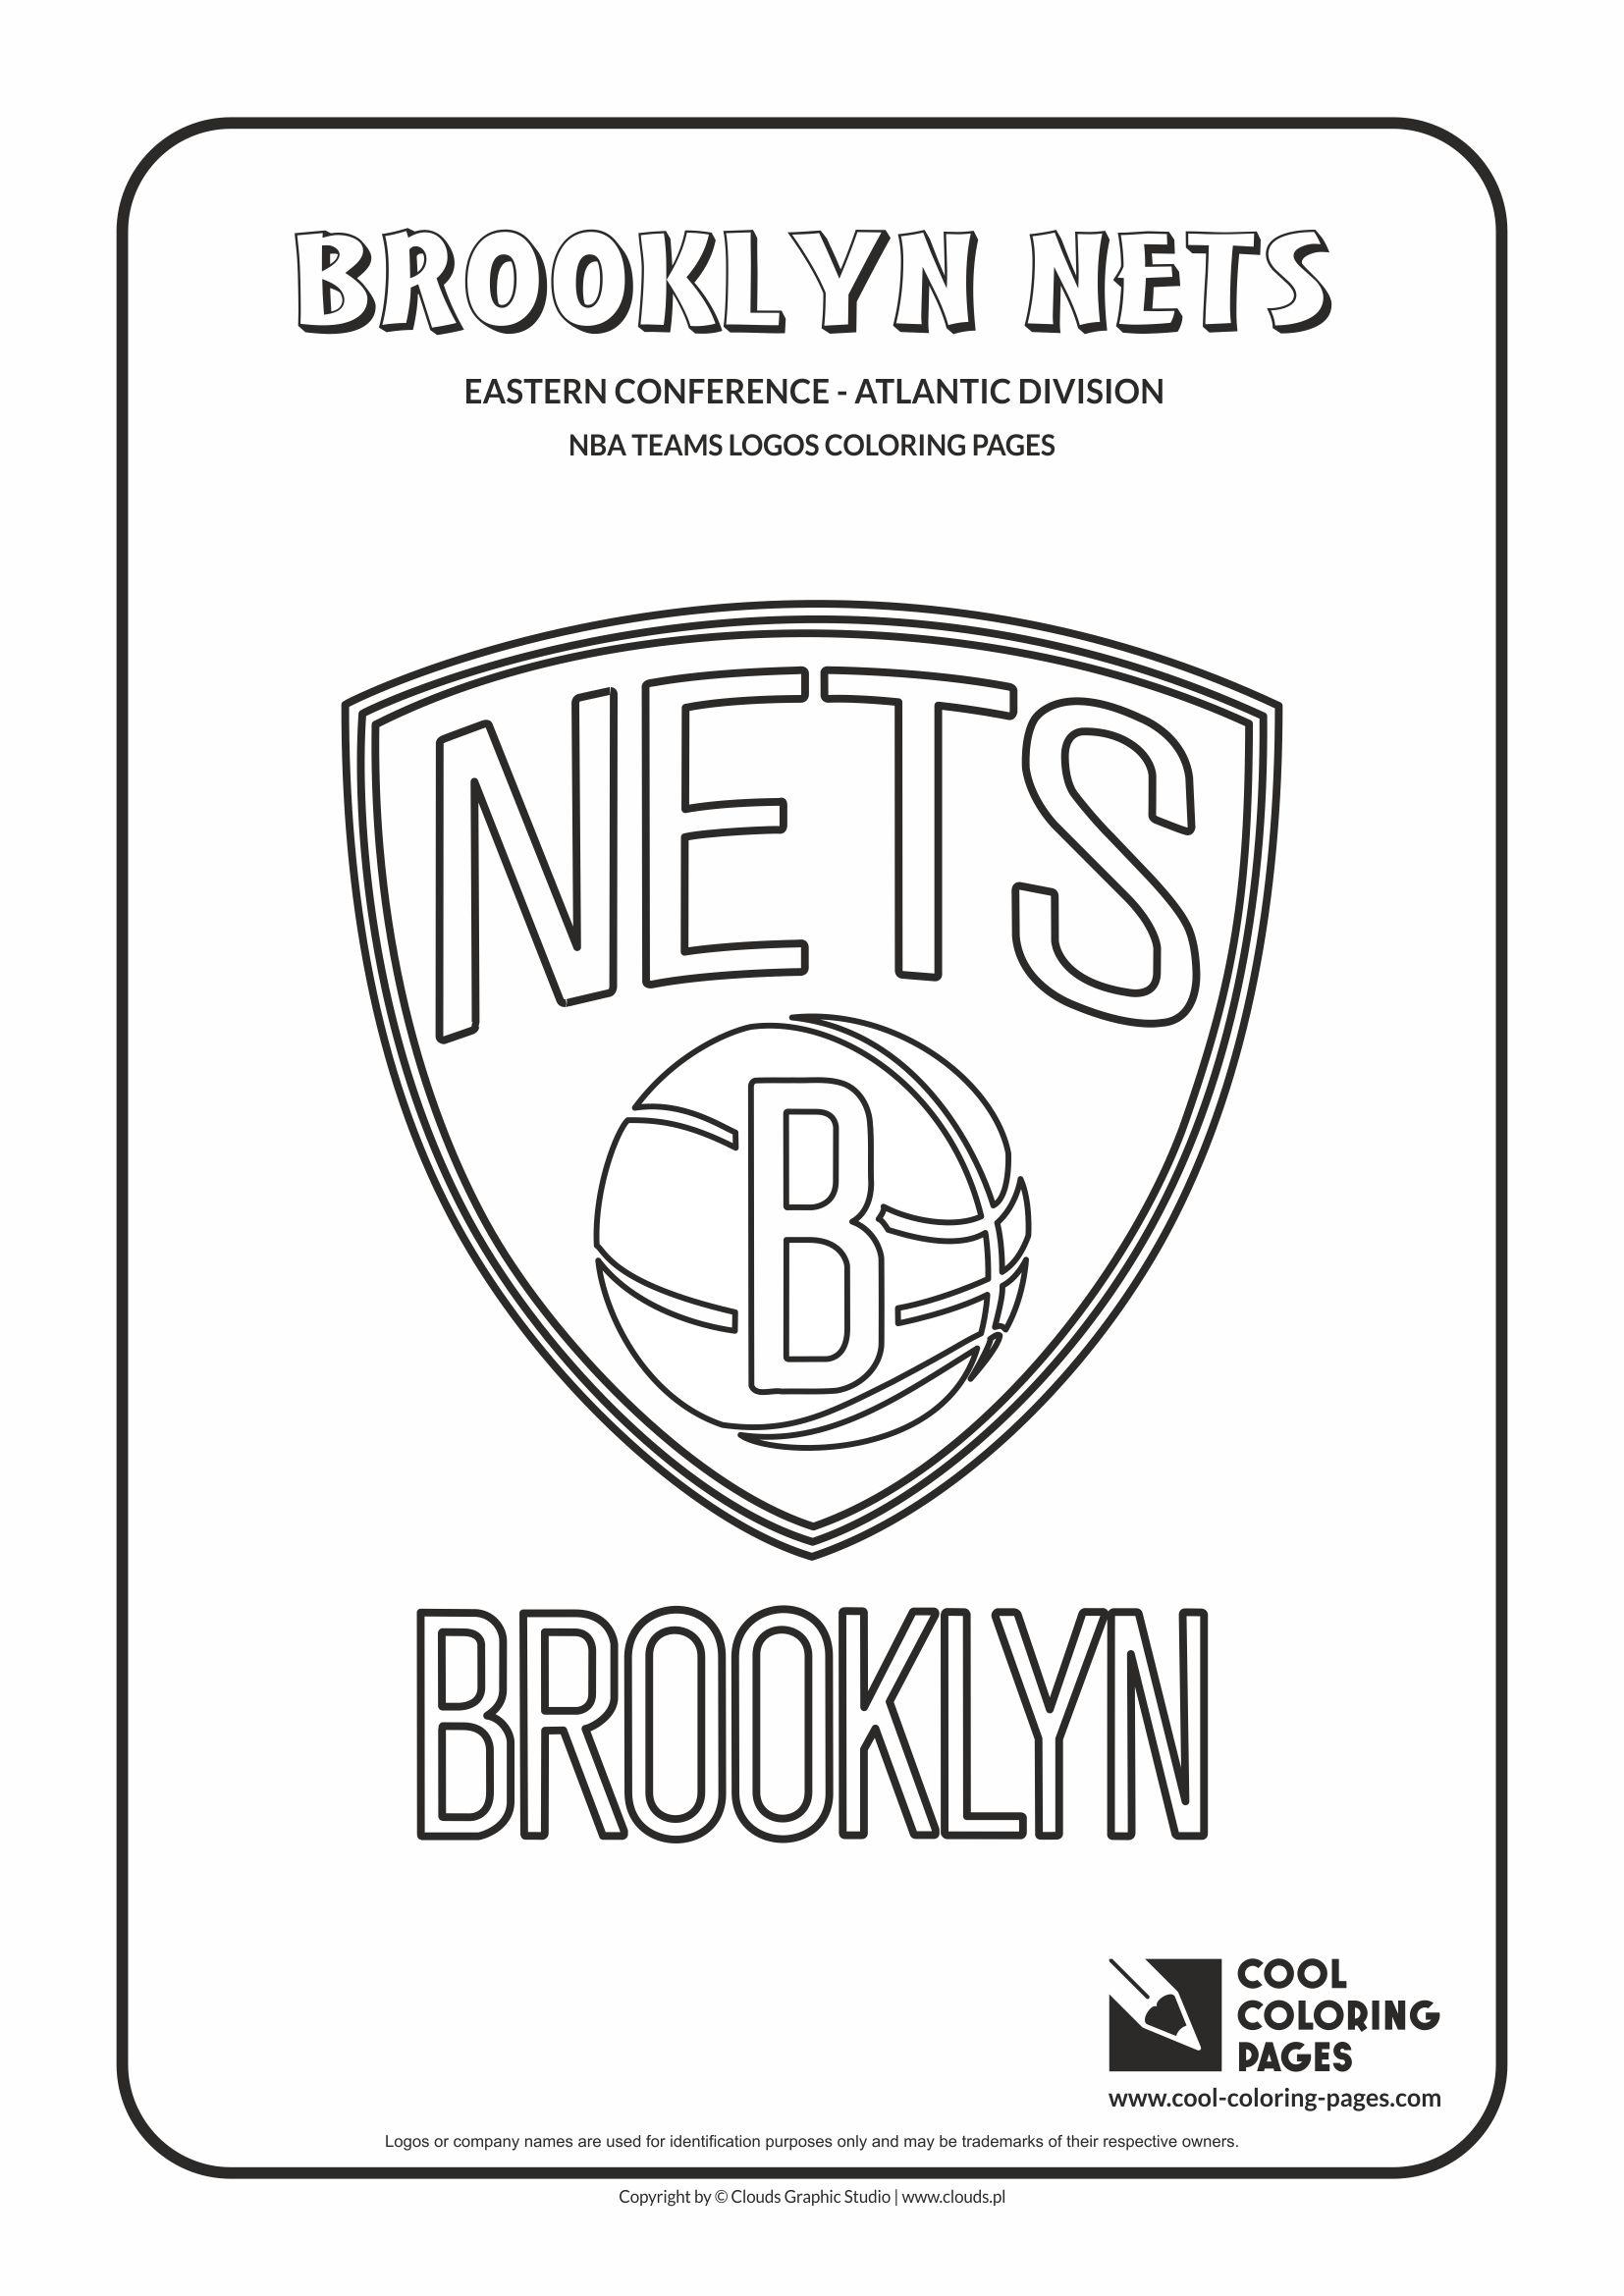 Cool Coloring Pages Brooklyn Nets - NBA basketball teams ...